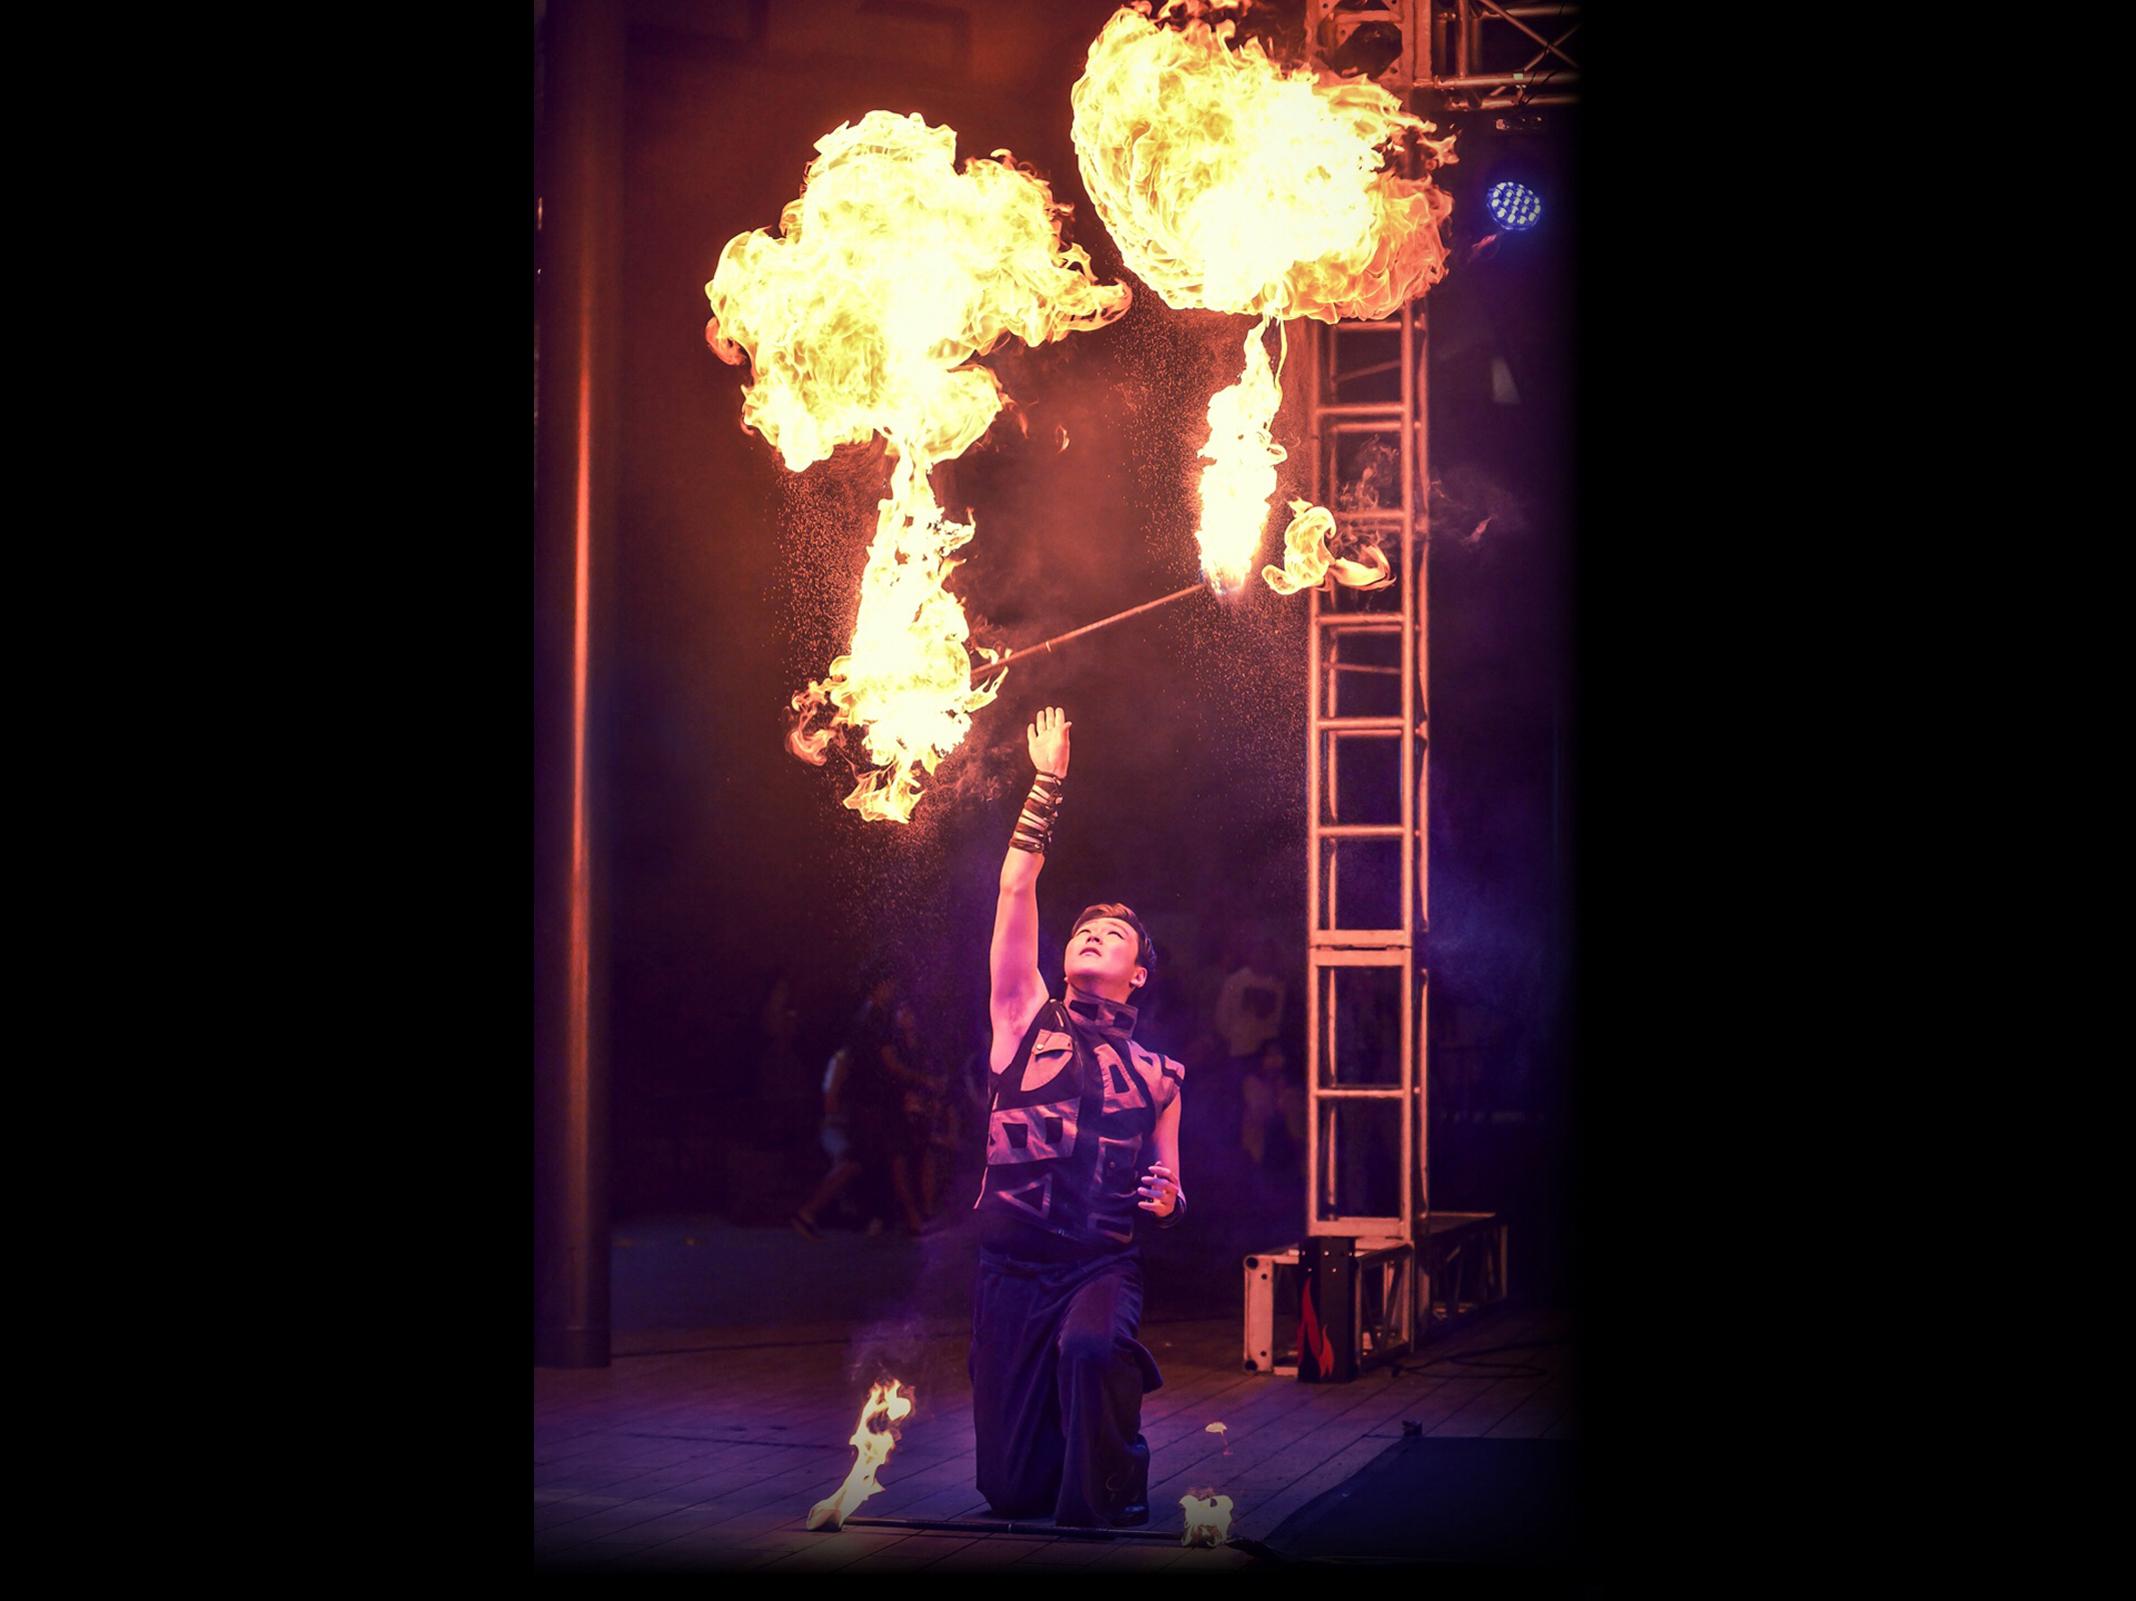 Fire Arts_Flaming Fire team_hunyflow (2)